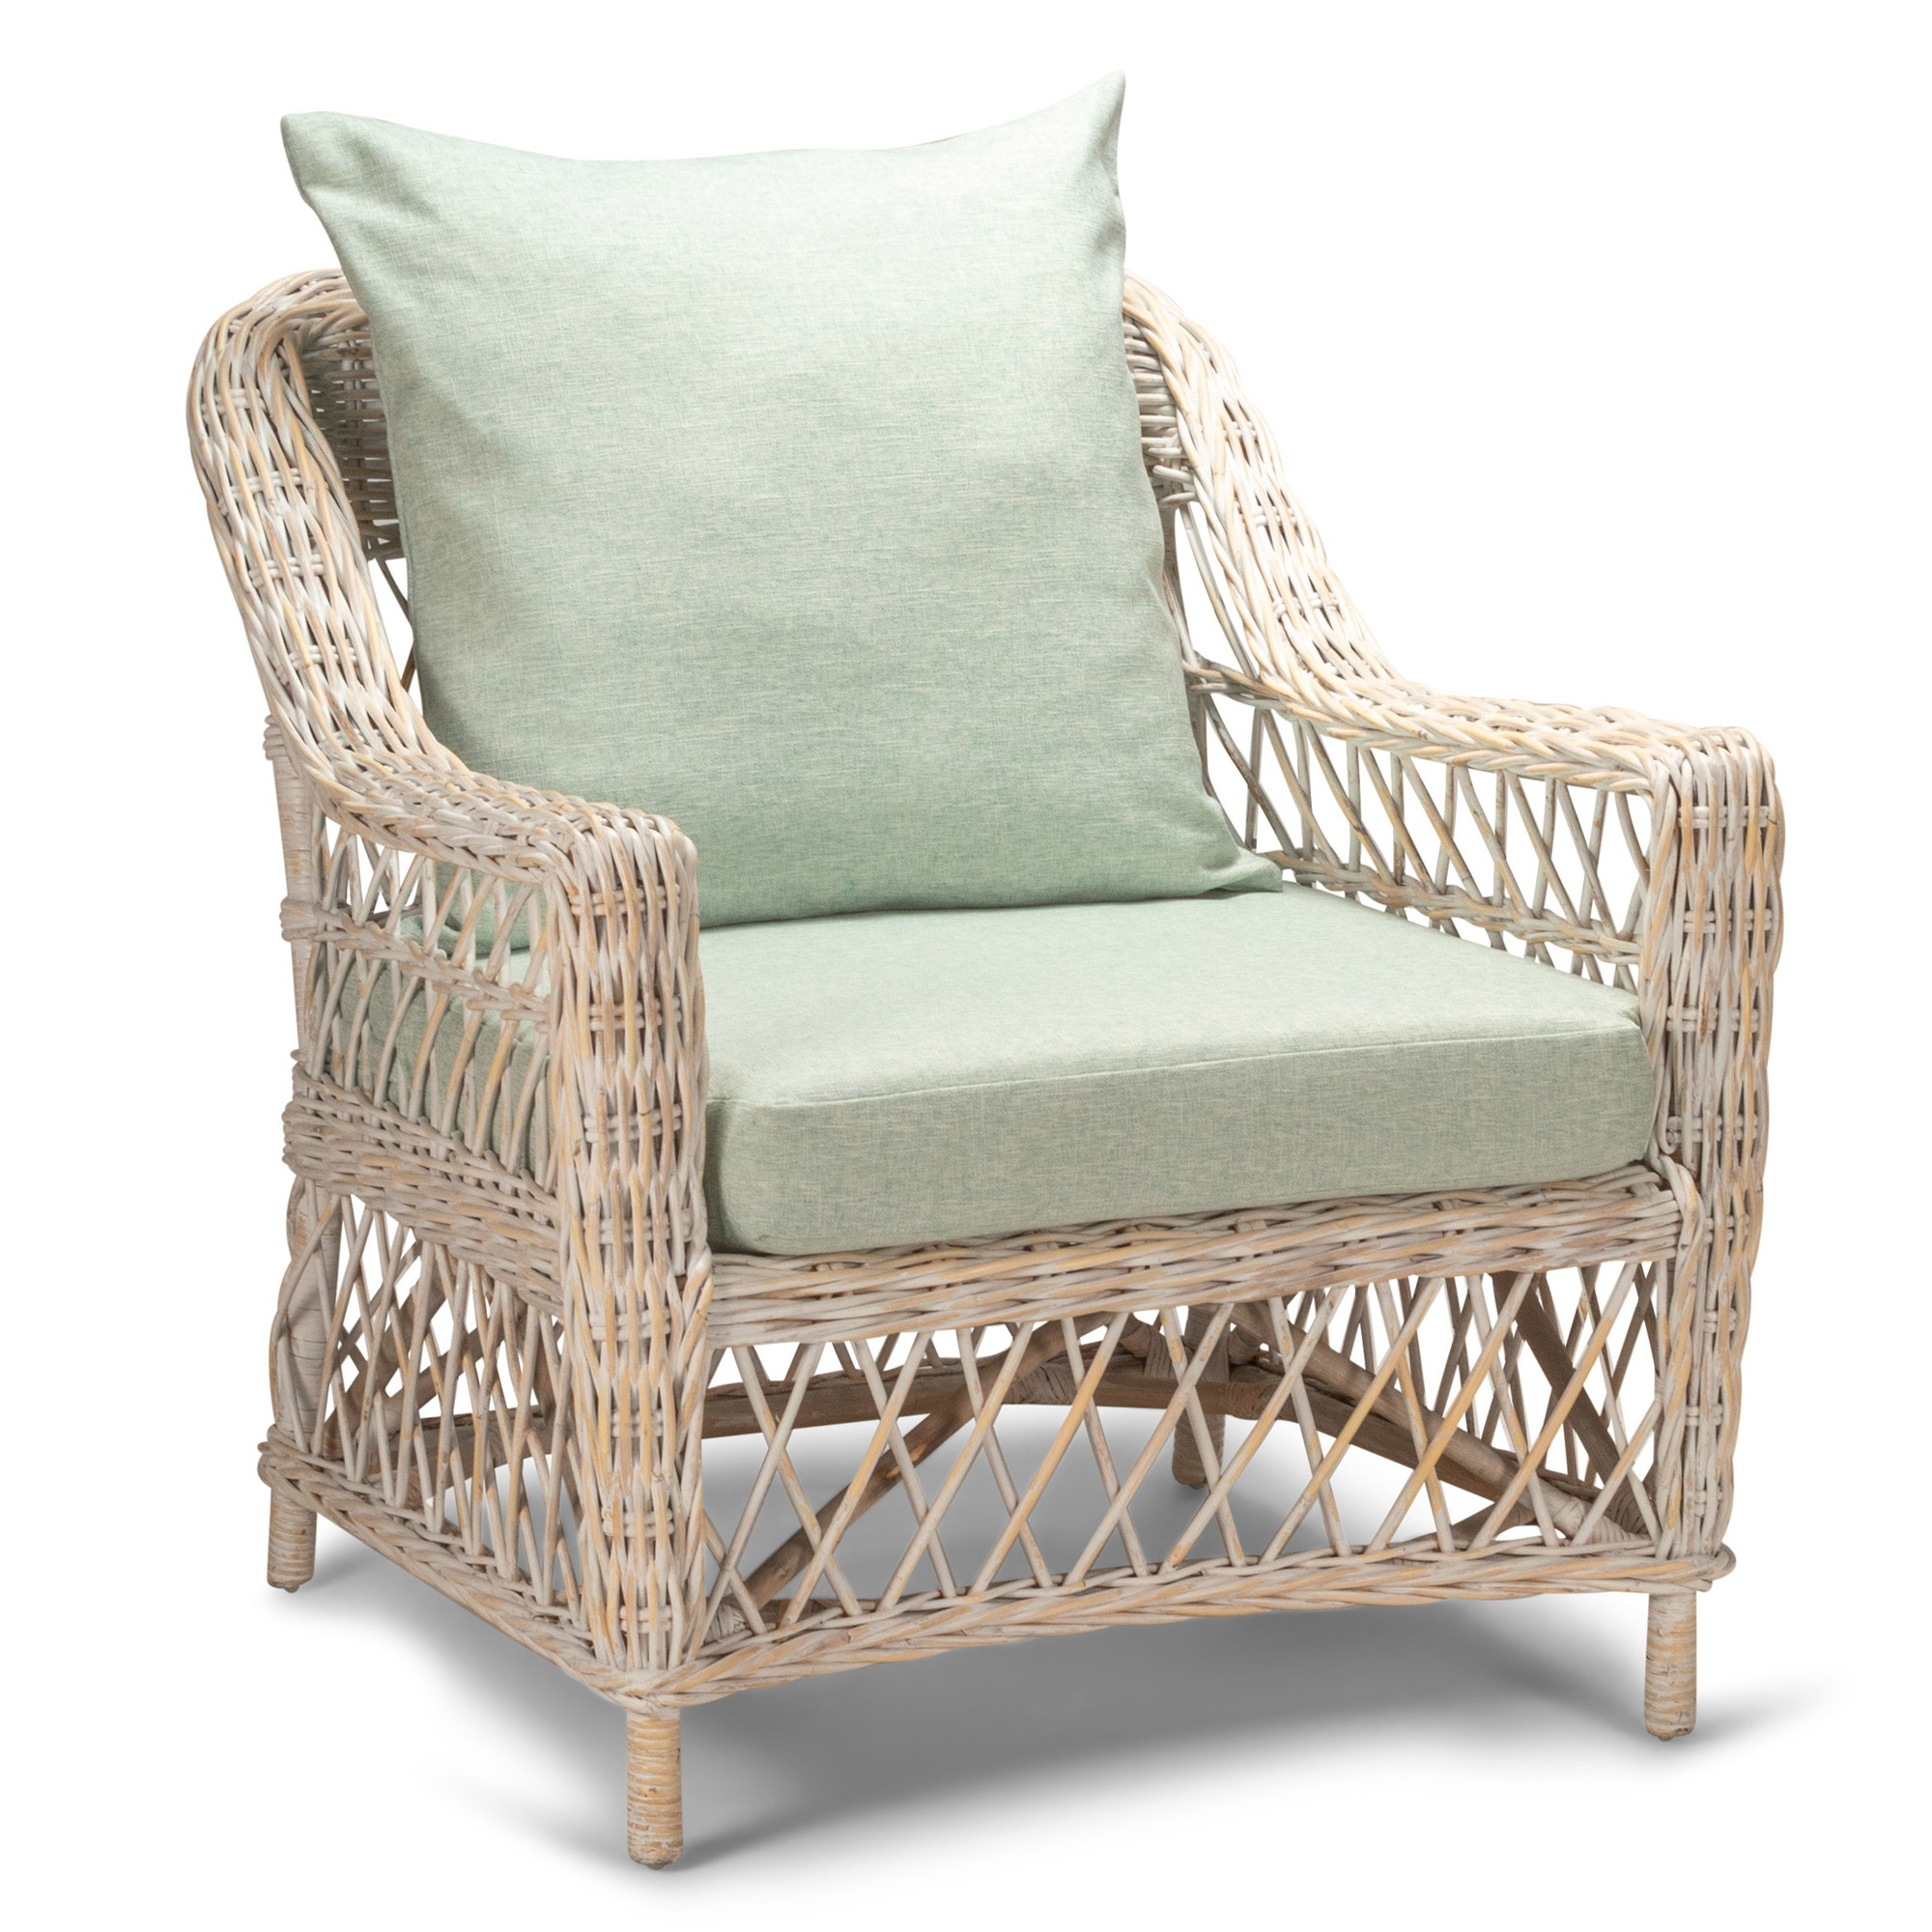 Nassau Rattan Armchair, White Wash / Seafoam